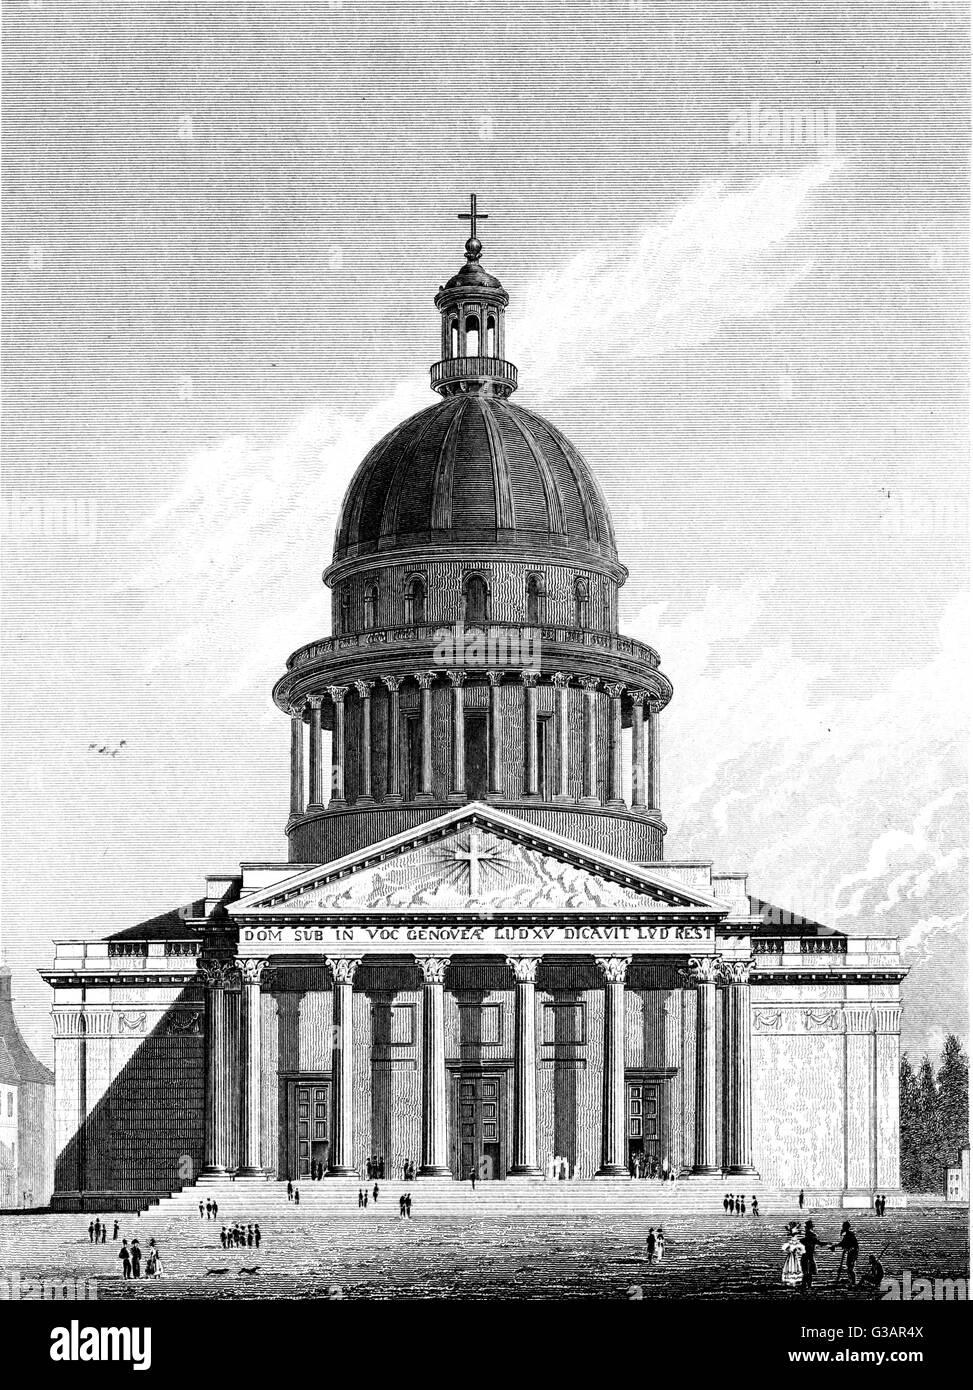 Paris, France - Eglise Sainte-Genevieve.     Date: 1829 Stock Photo